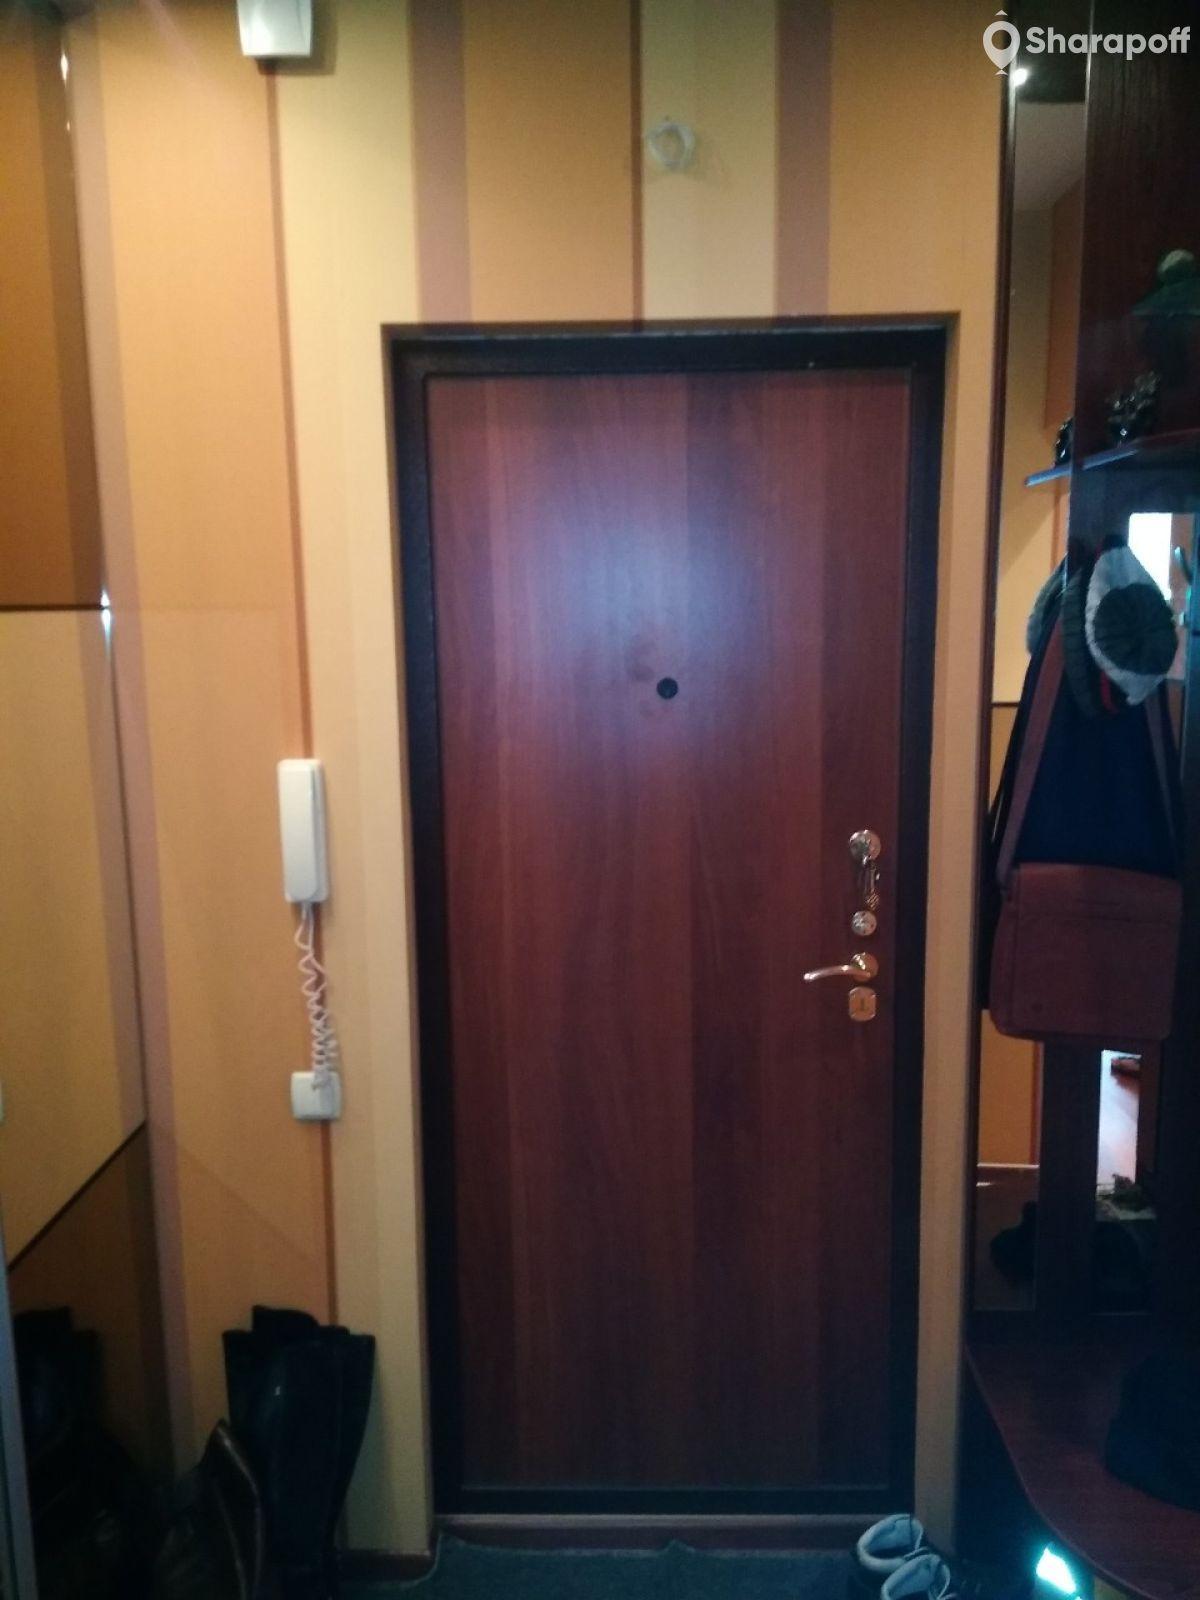 Сдам в аренду 1-комн. квартиру, Москва, Москва, Окская ул, 3 к1